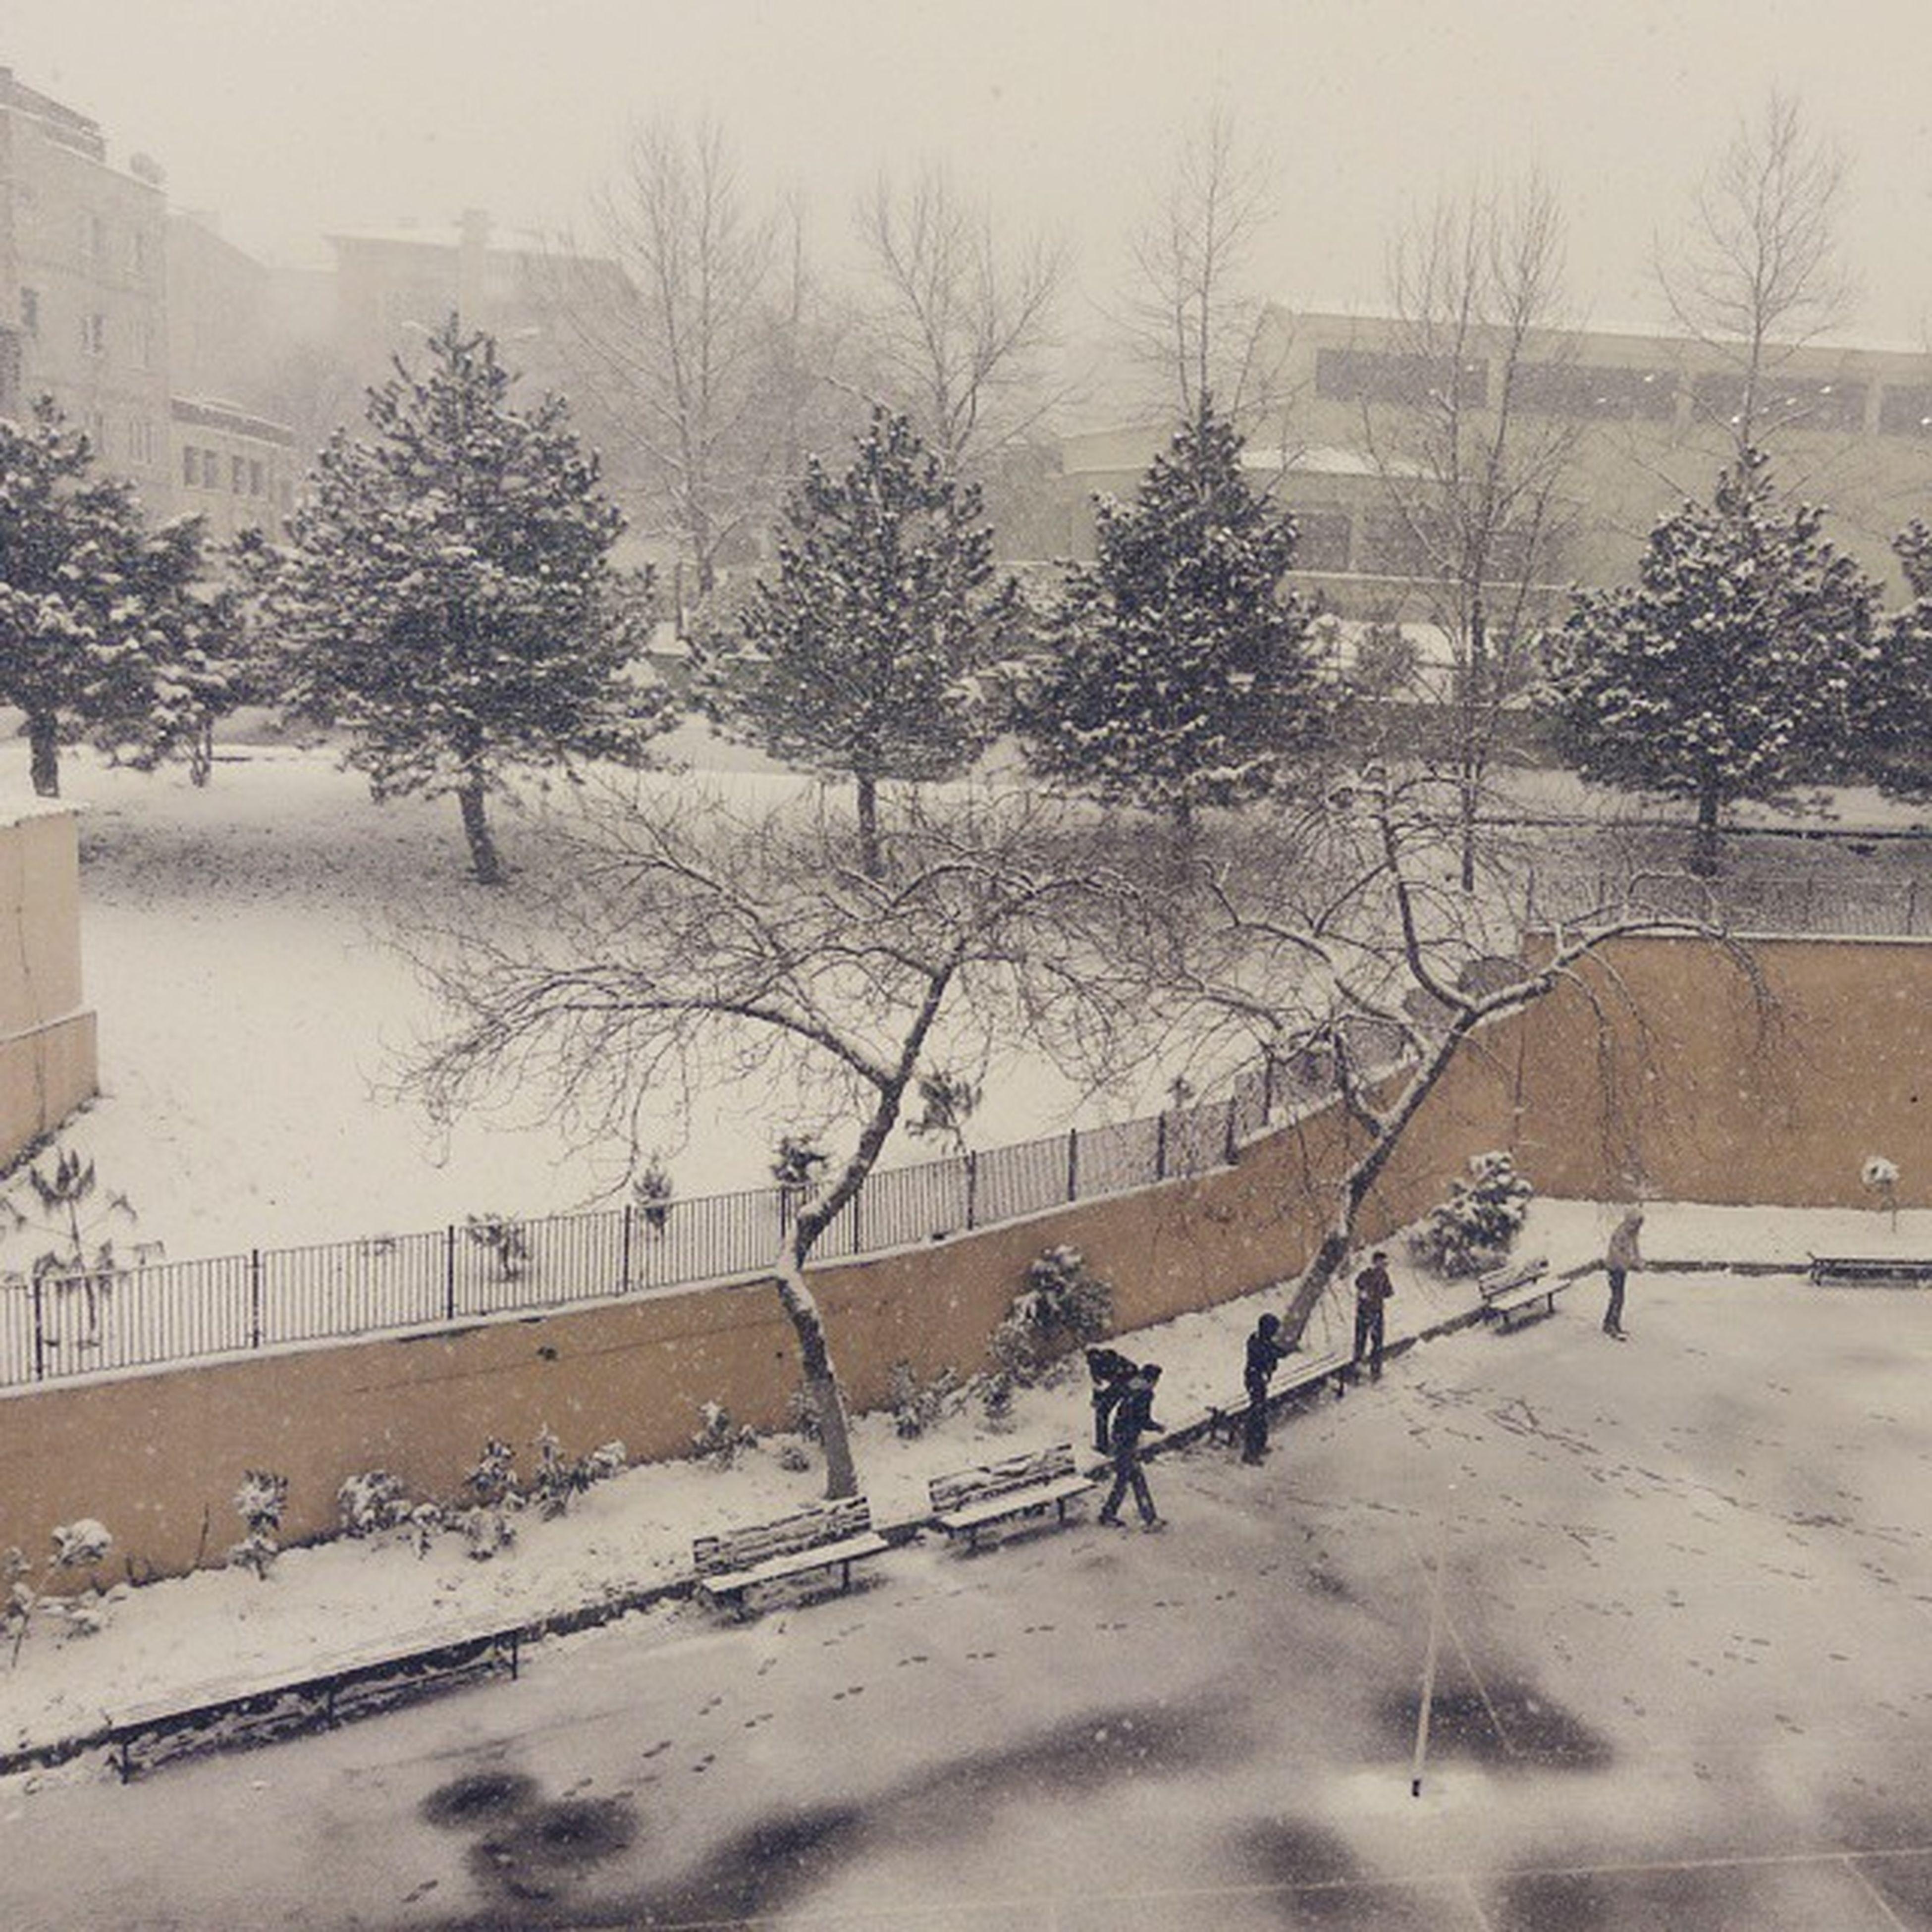 Avpal Snow School Day excellent